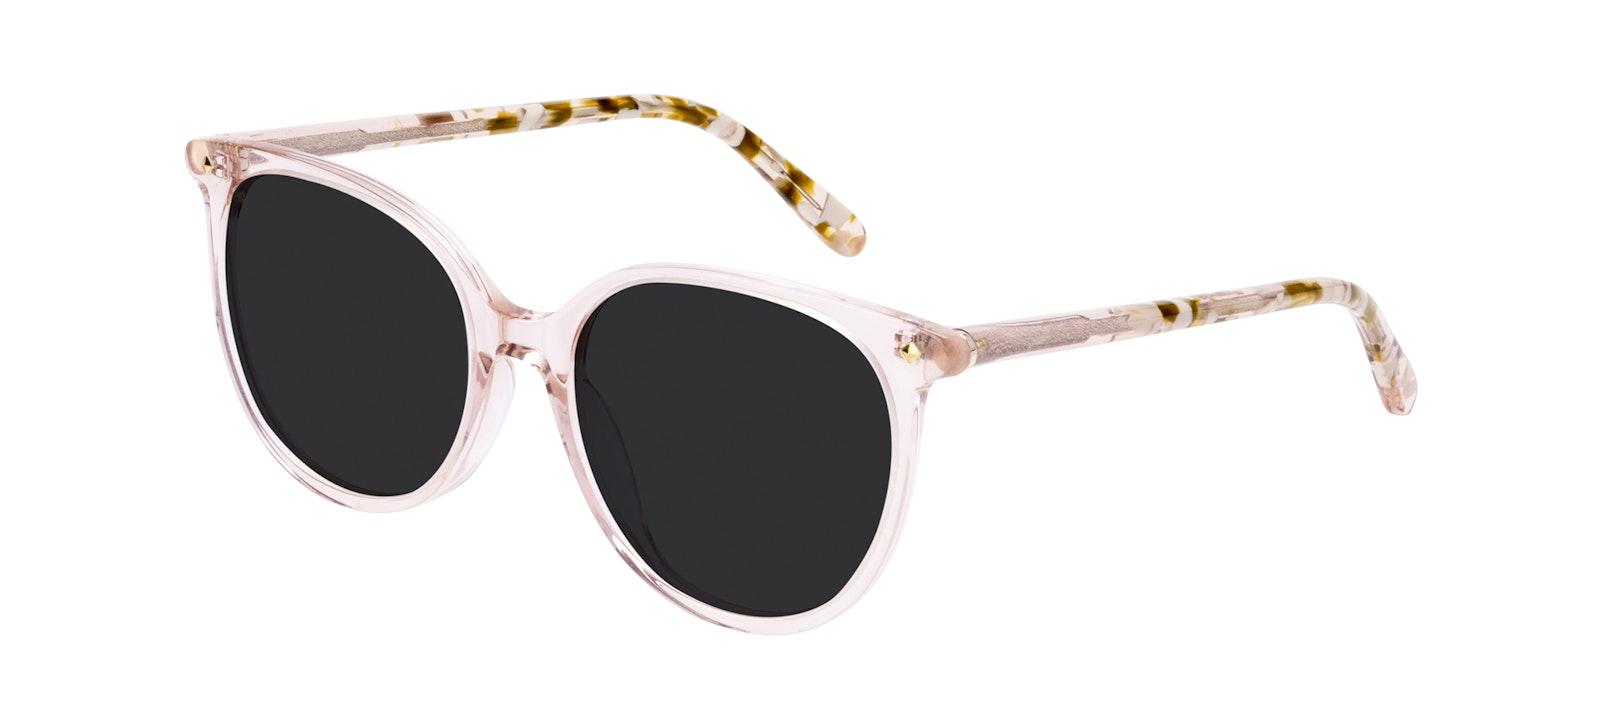 Affordable Fashion Glasses Round Sunglasses Women Area Petite Rose Tilt